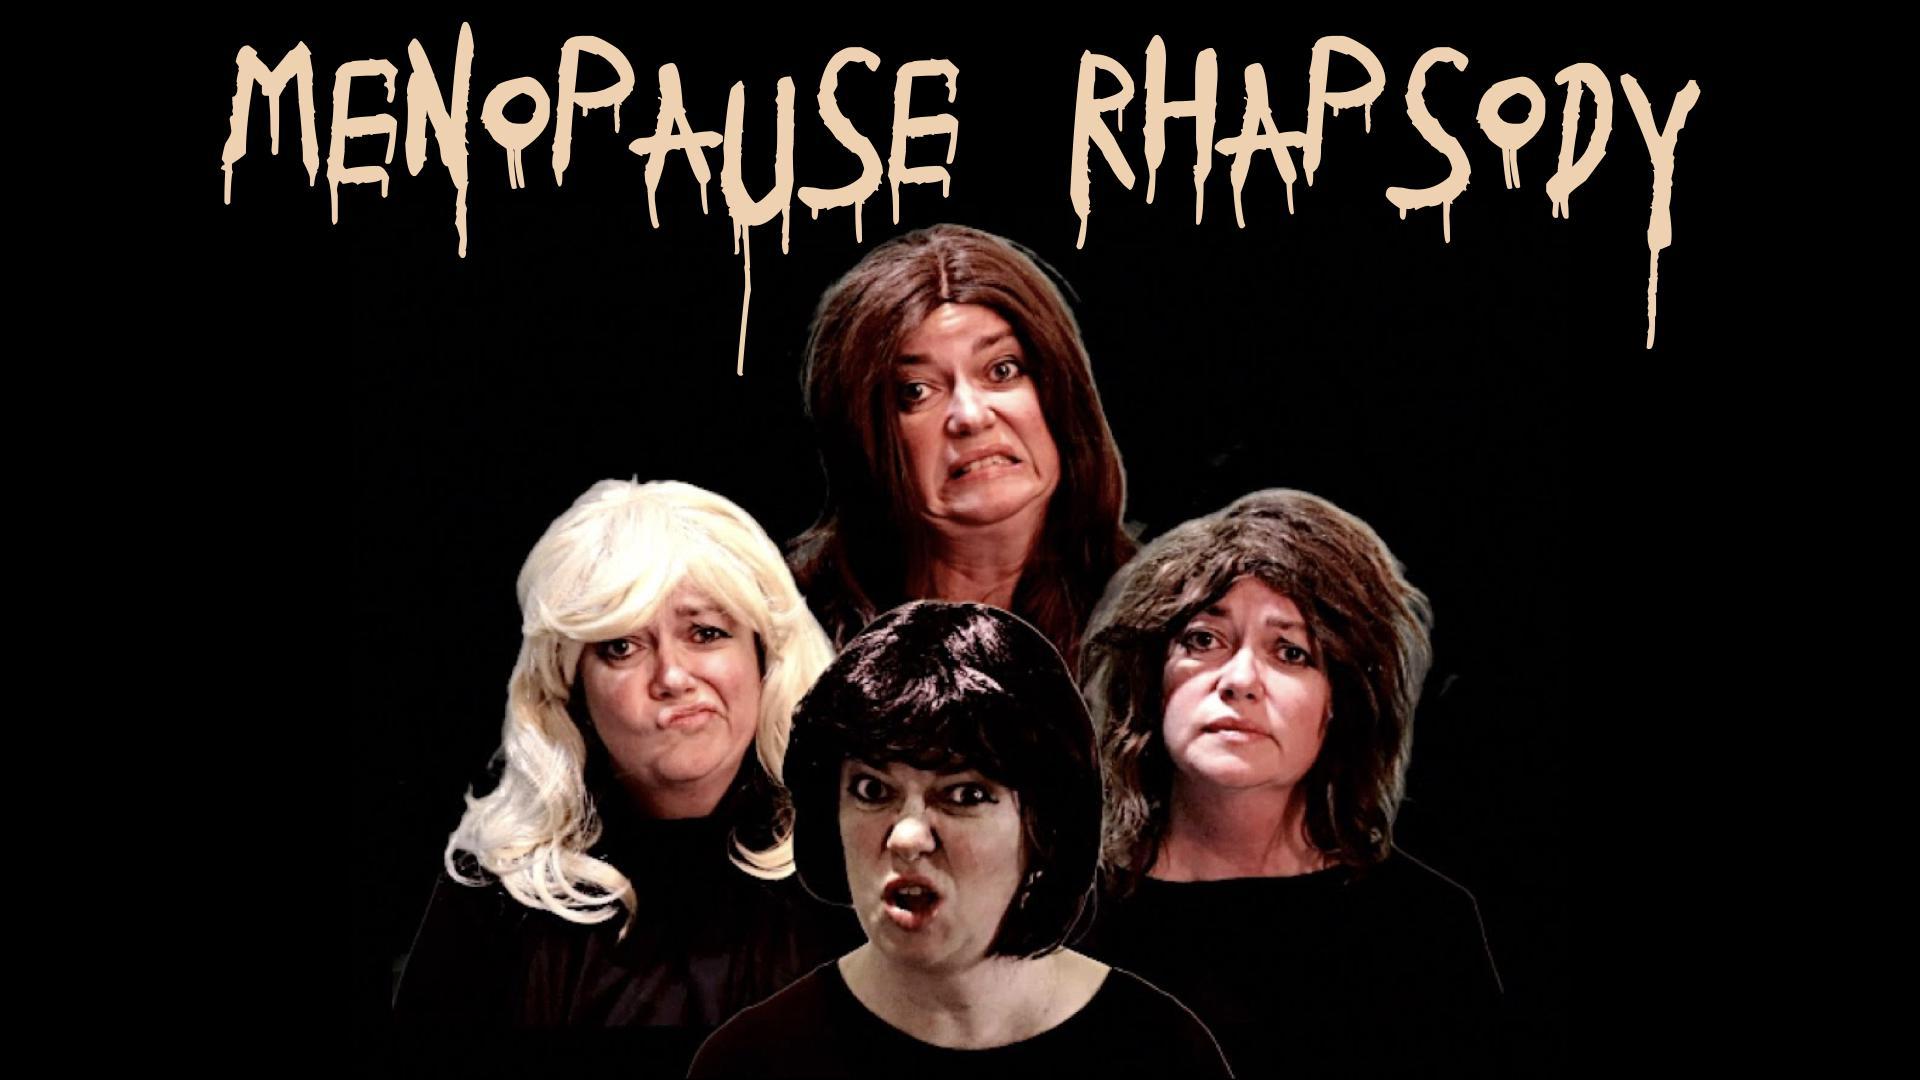 Menopause Rhapsody